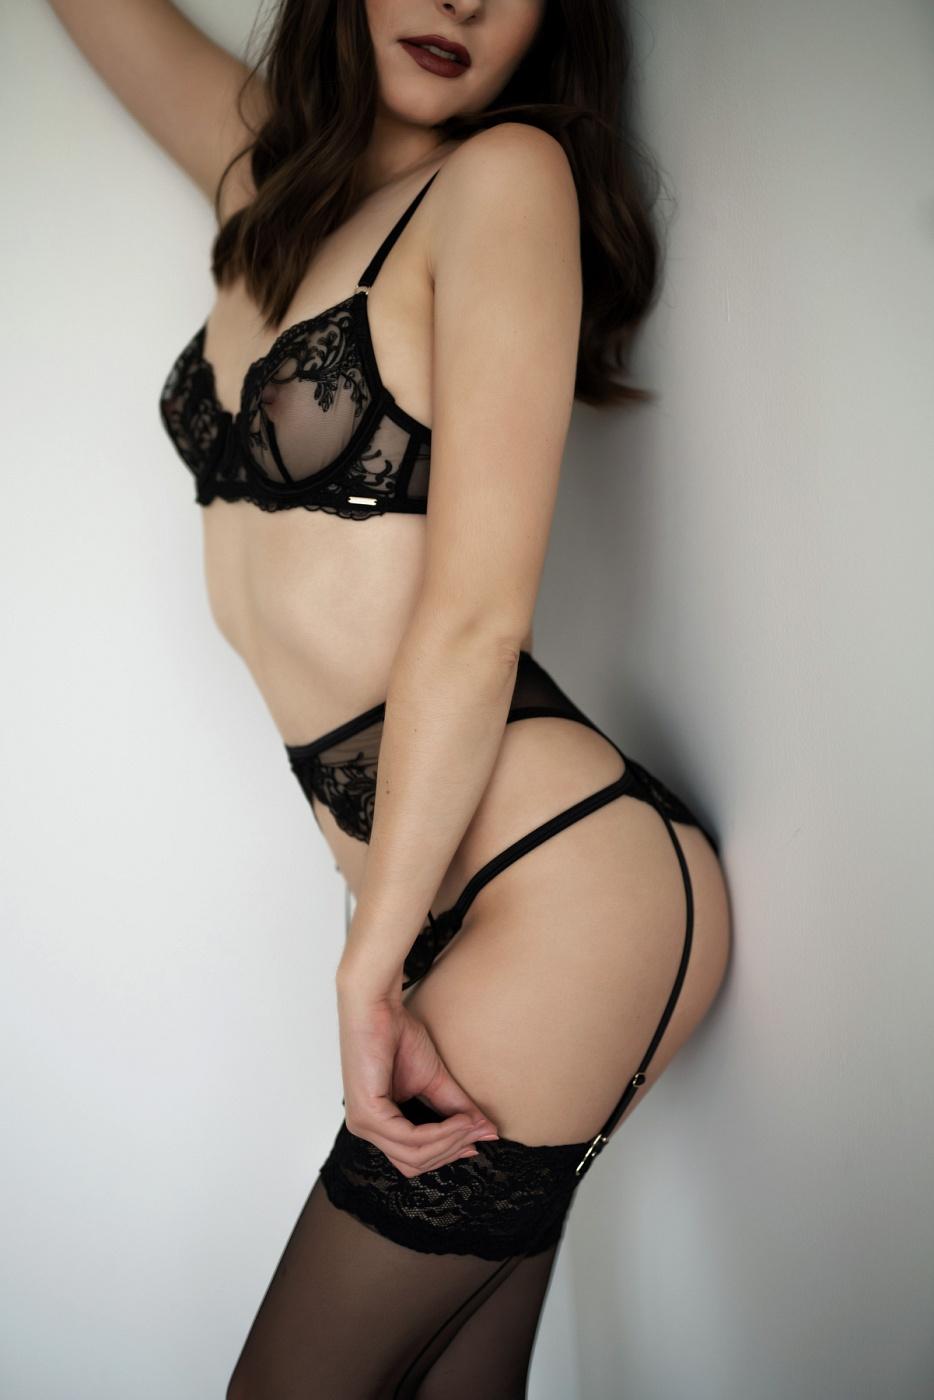 Amelia Greene